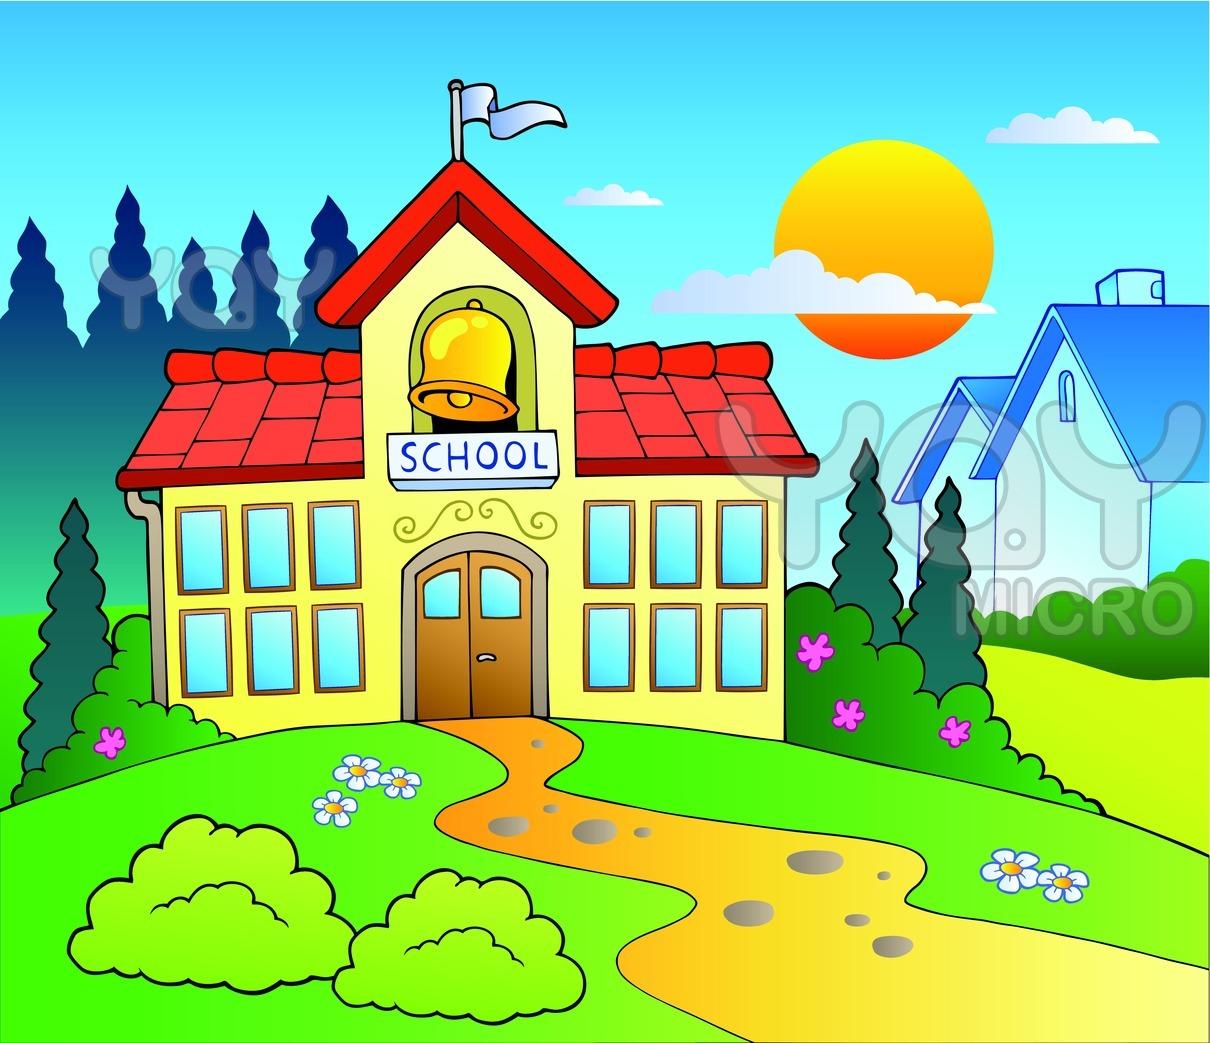 School Building Cartoon Images \x3cb\x3ecartoon school building\x3c/b